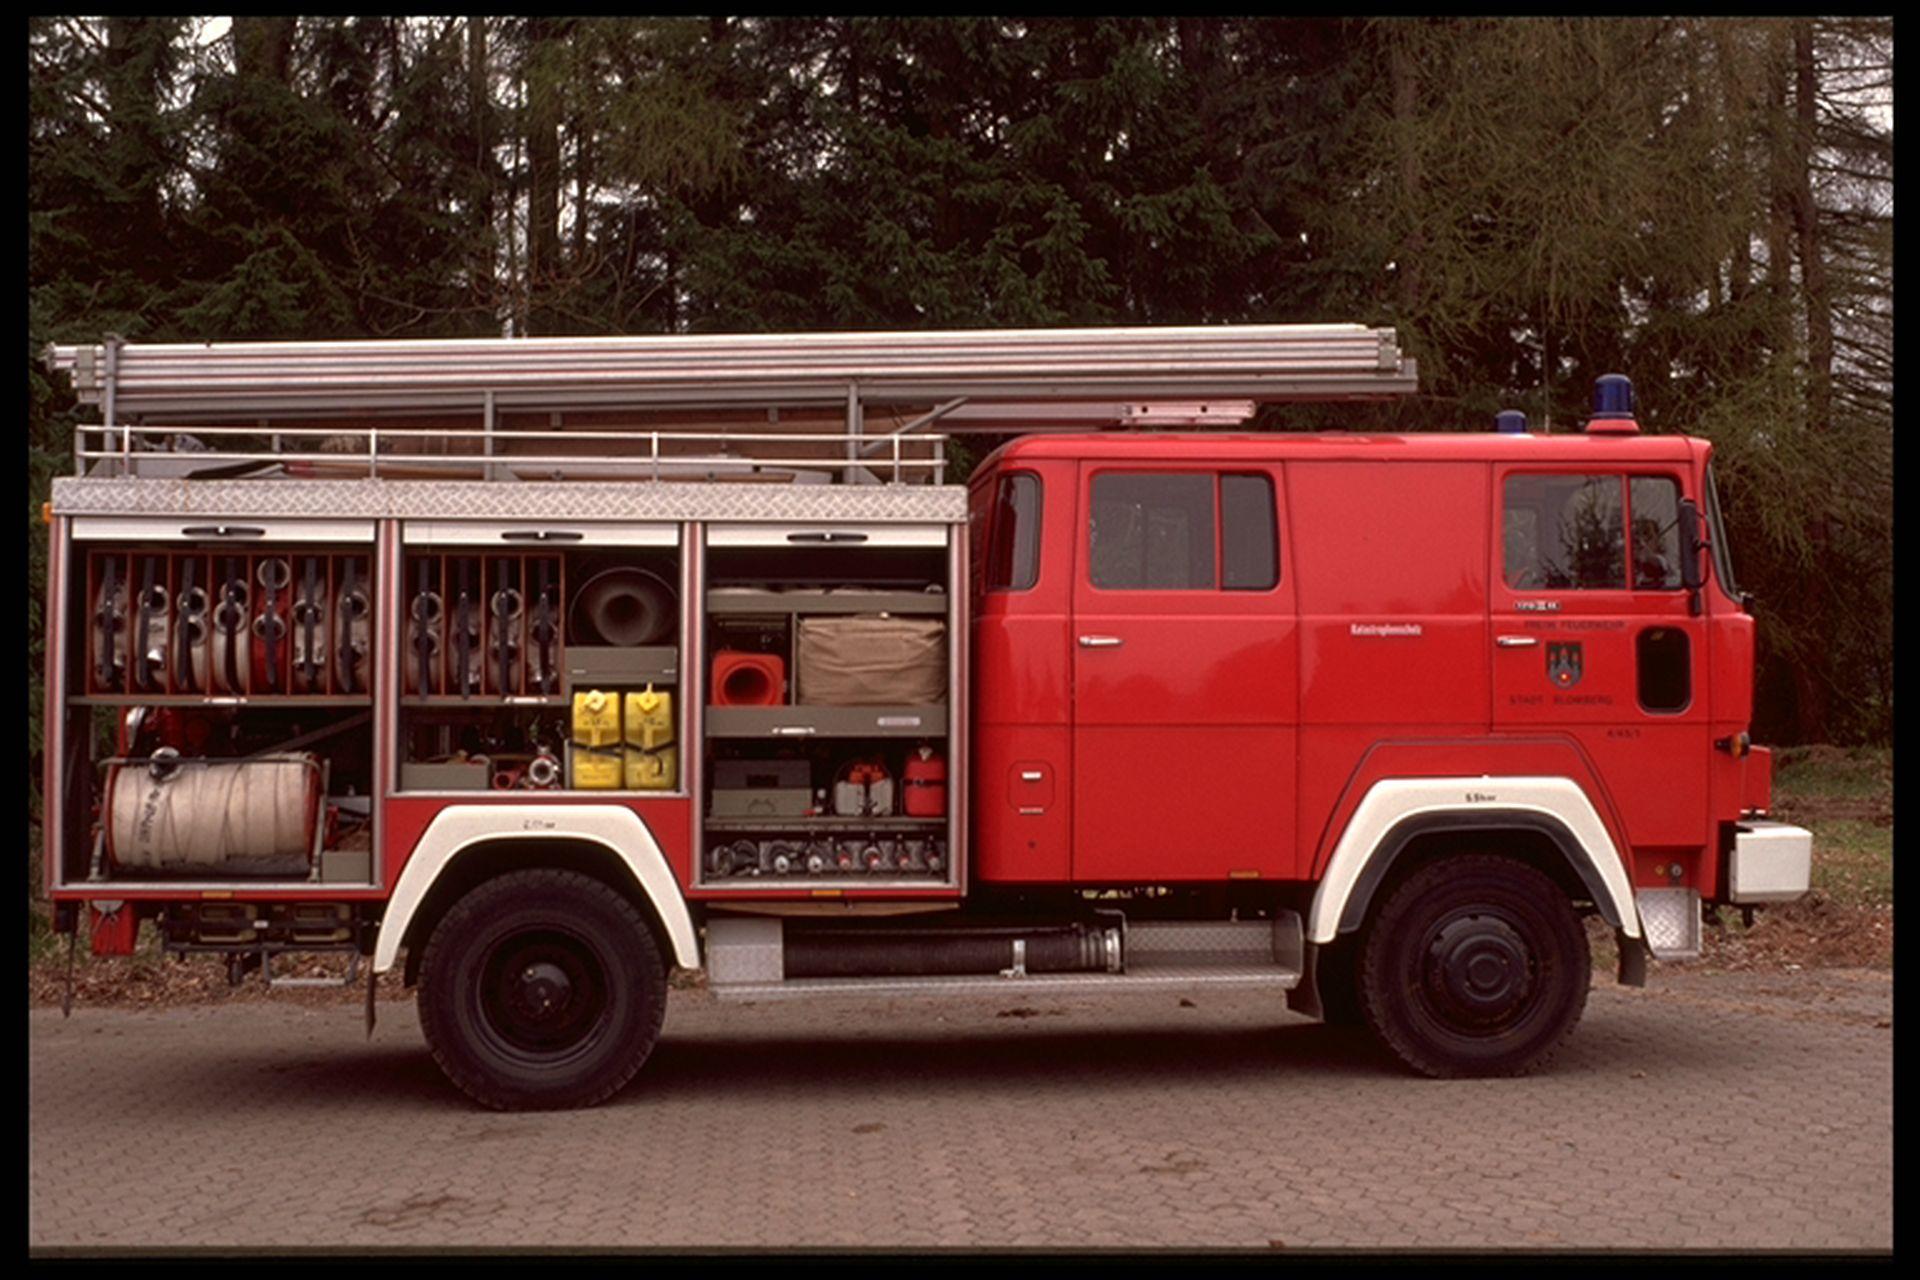 LF16TS (katschutz)